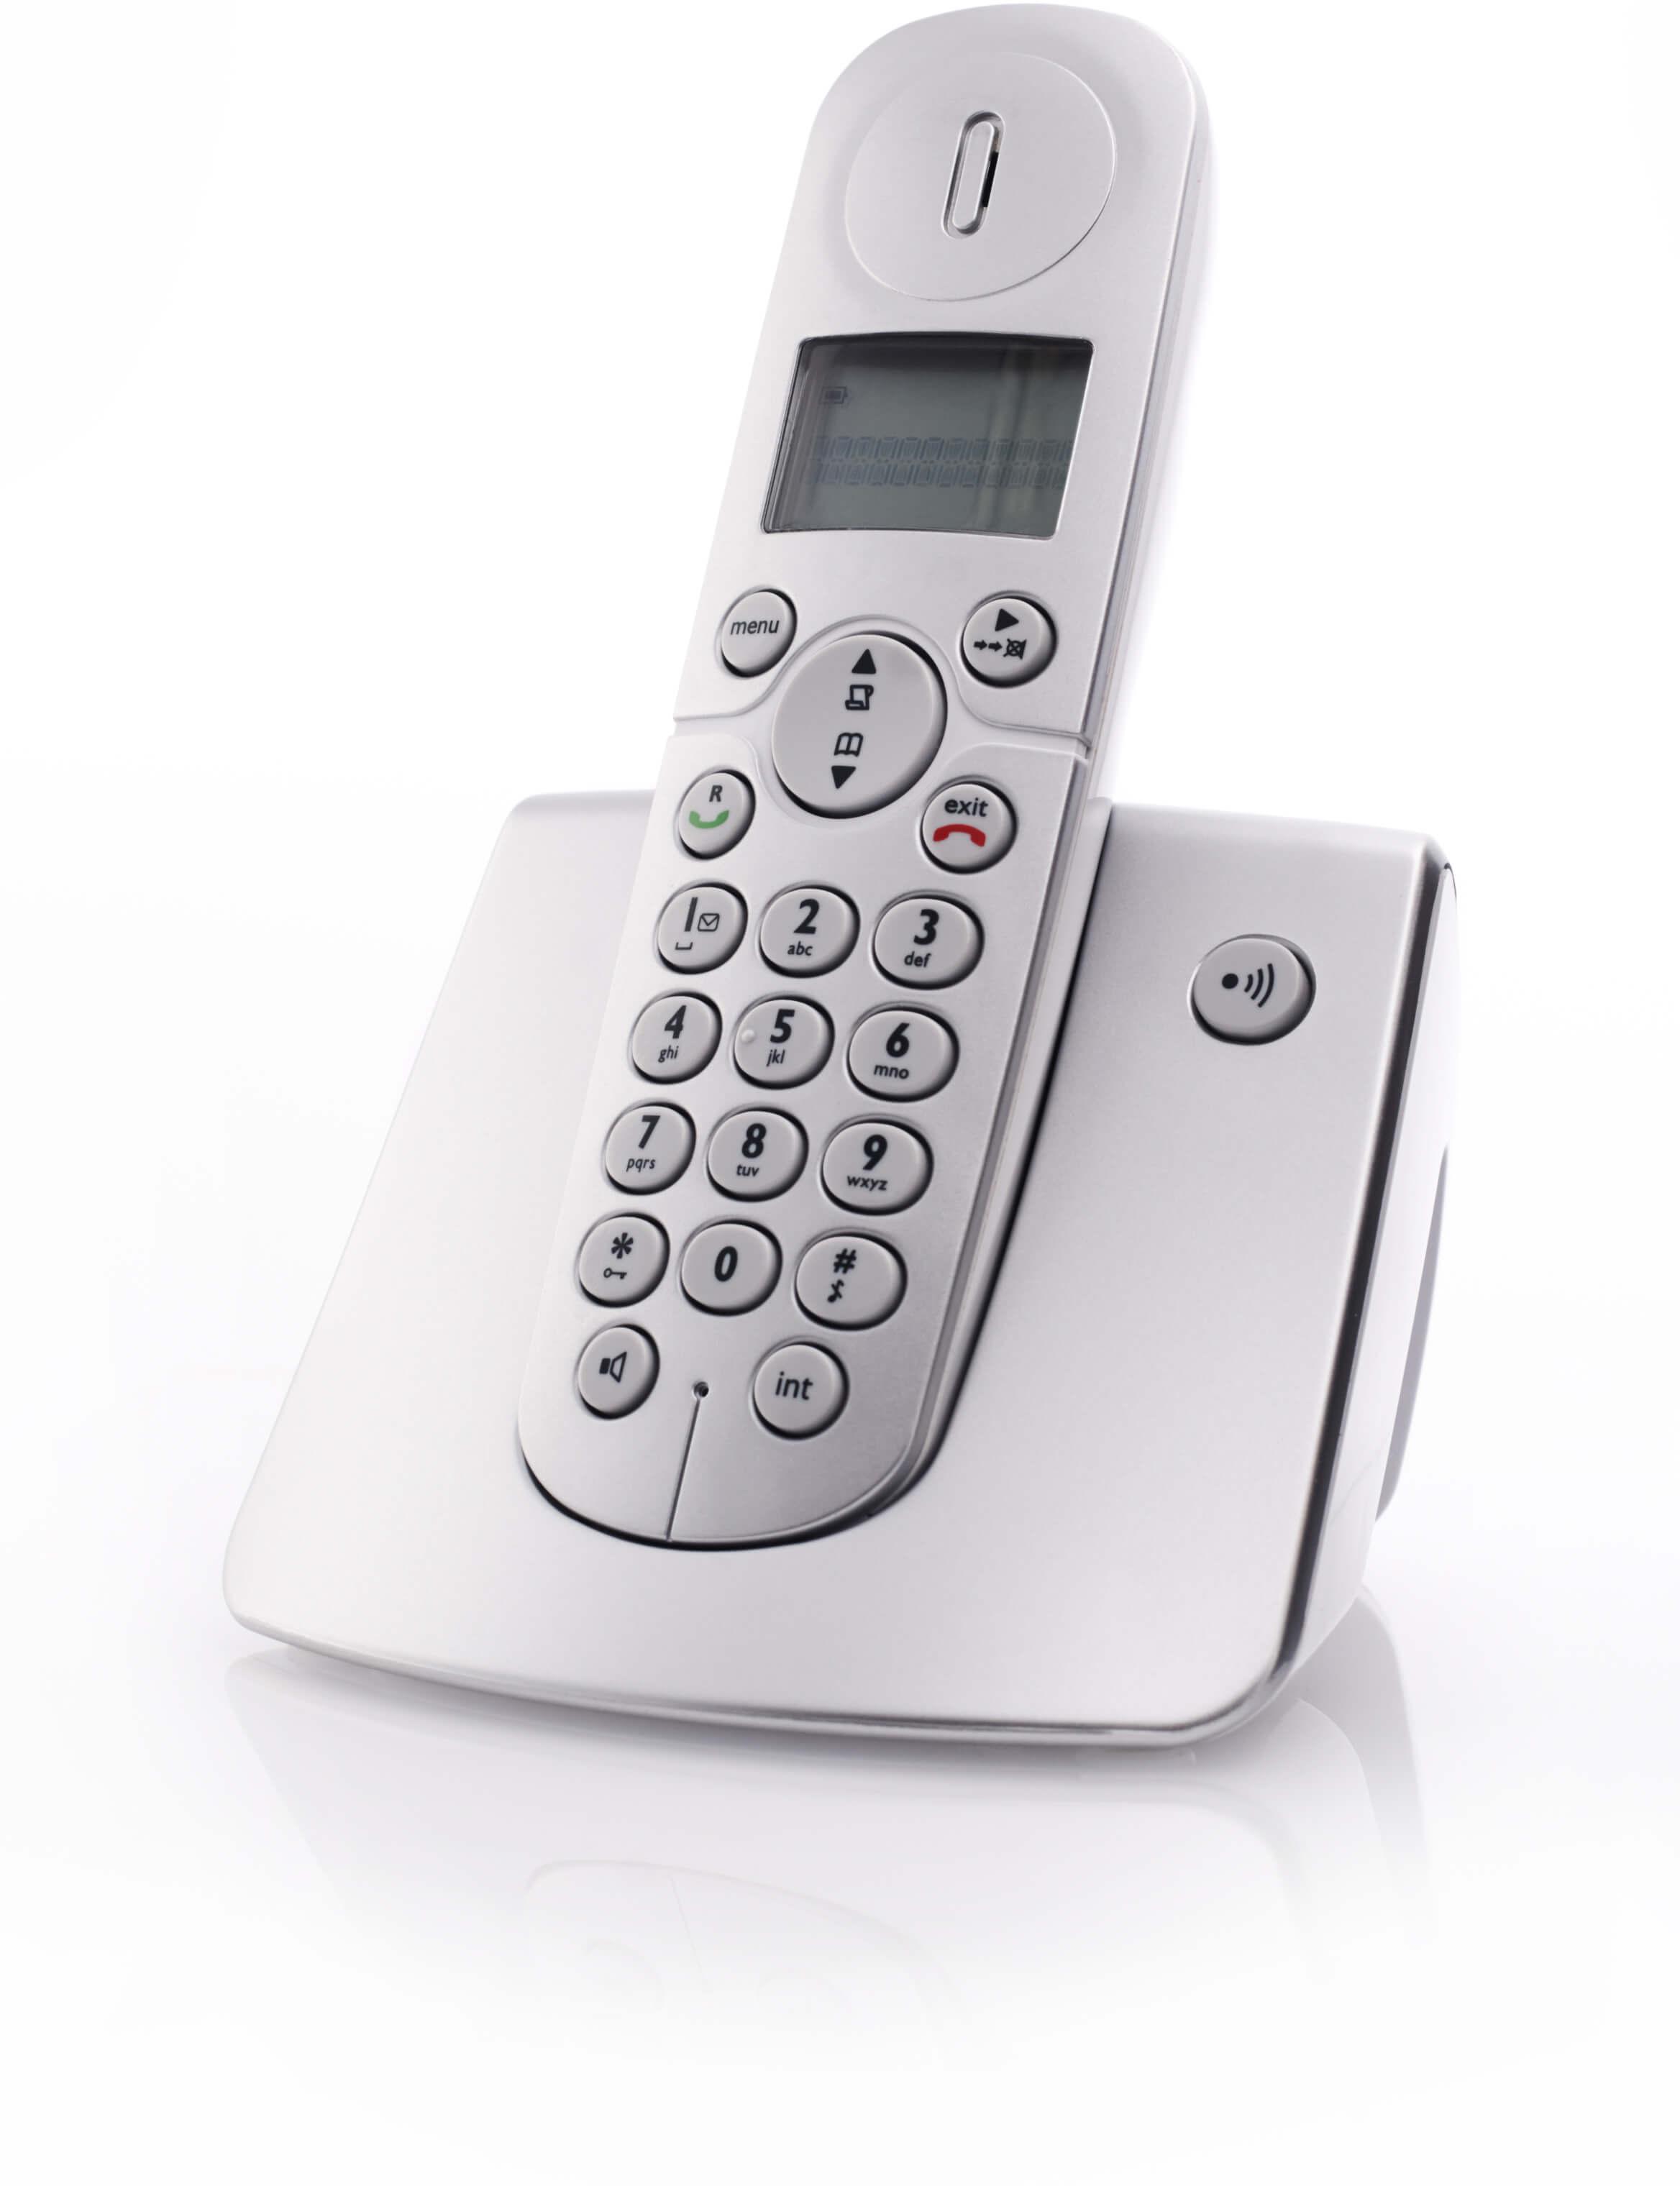 VOIP Phone   Home Phone   Wireless Internet   Air Advantage